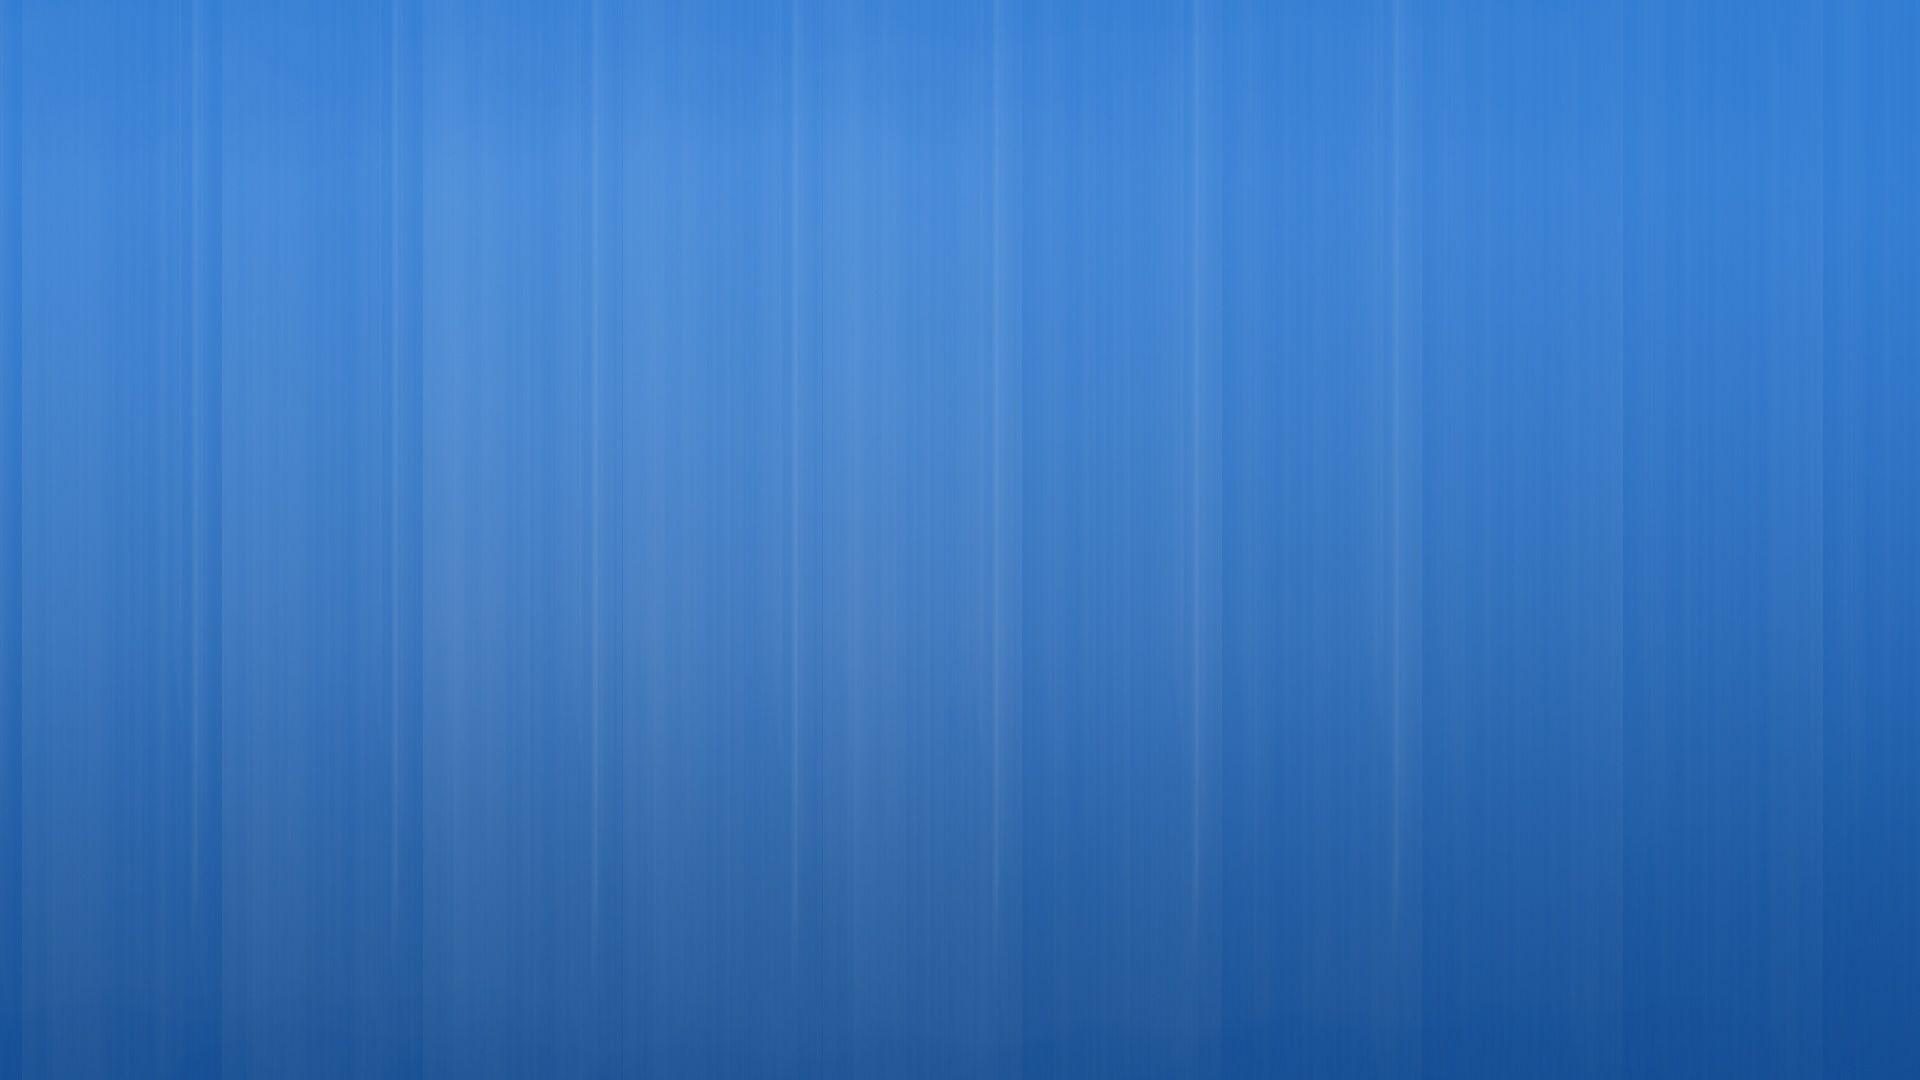 Hd Wallpaper Co Free Website Backgrounds 1920x1080 11082 Softblog